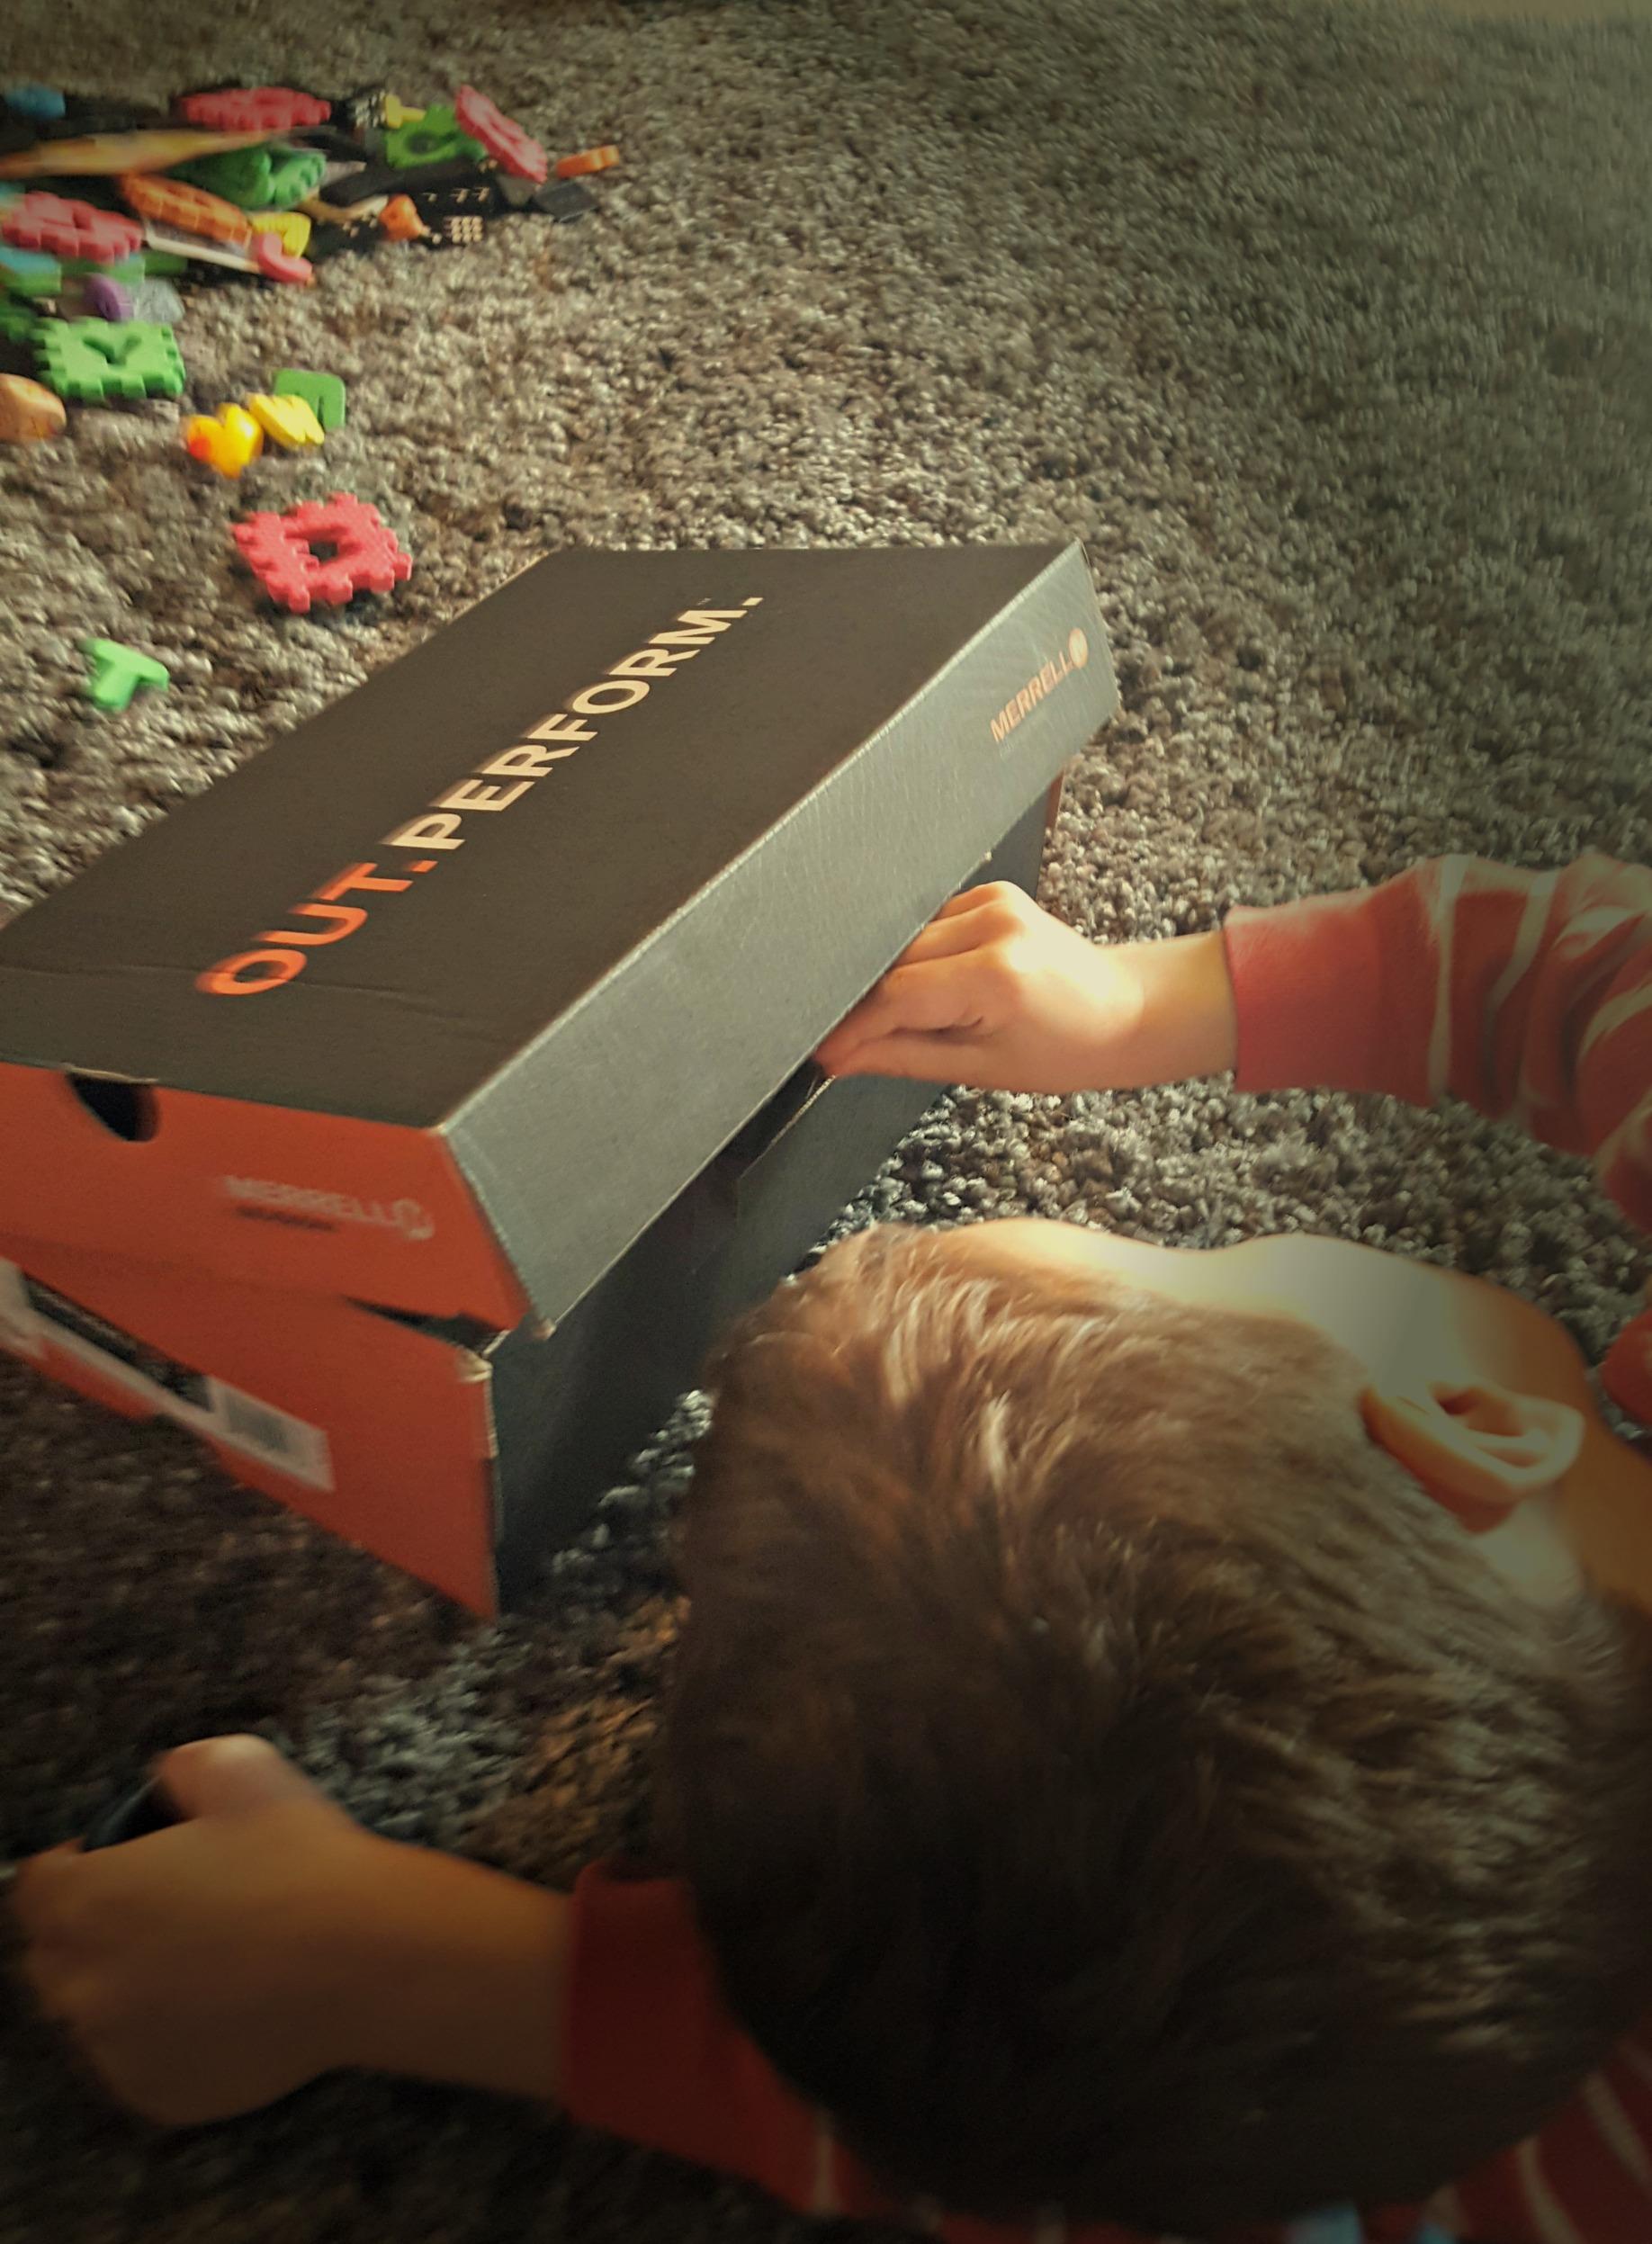 speech therapy shoe box